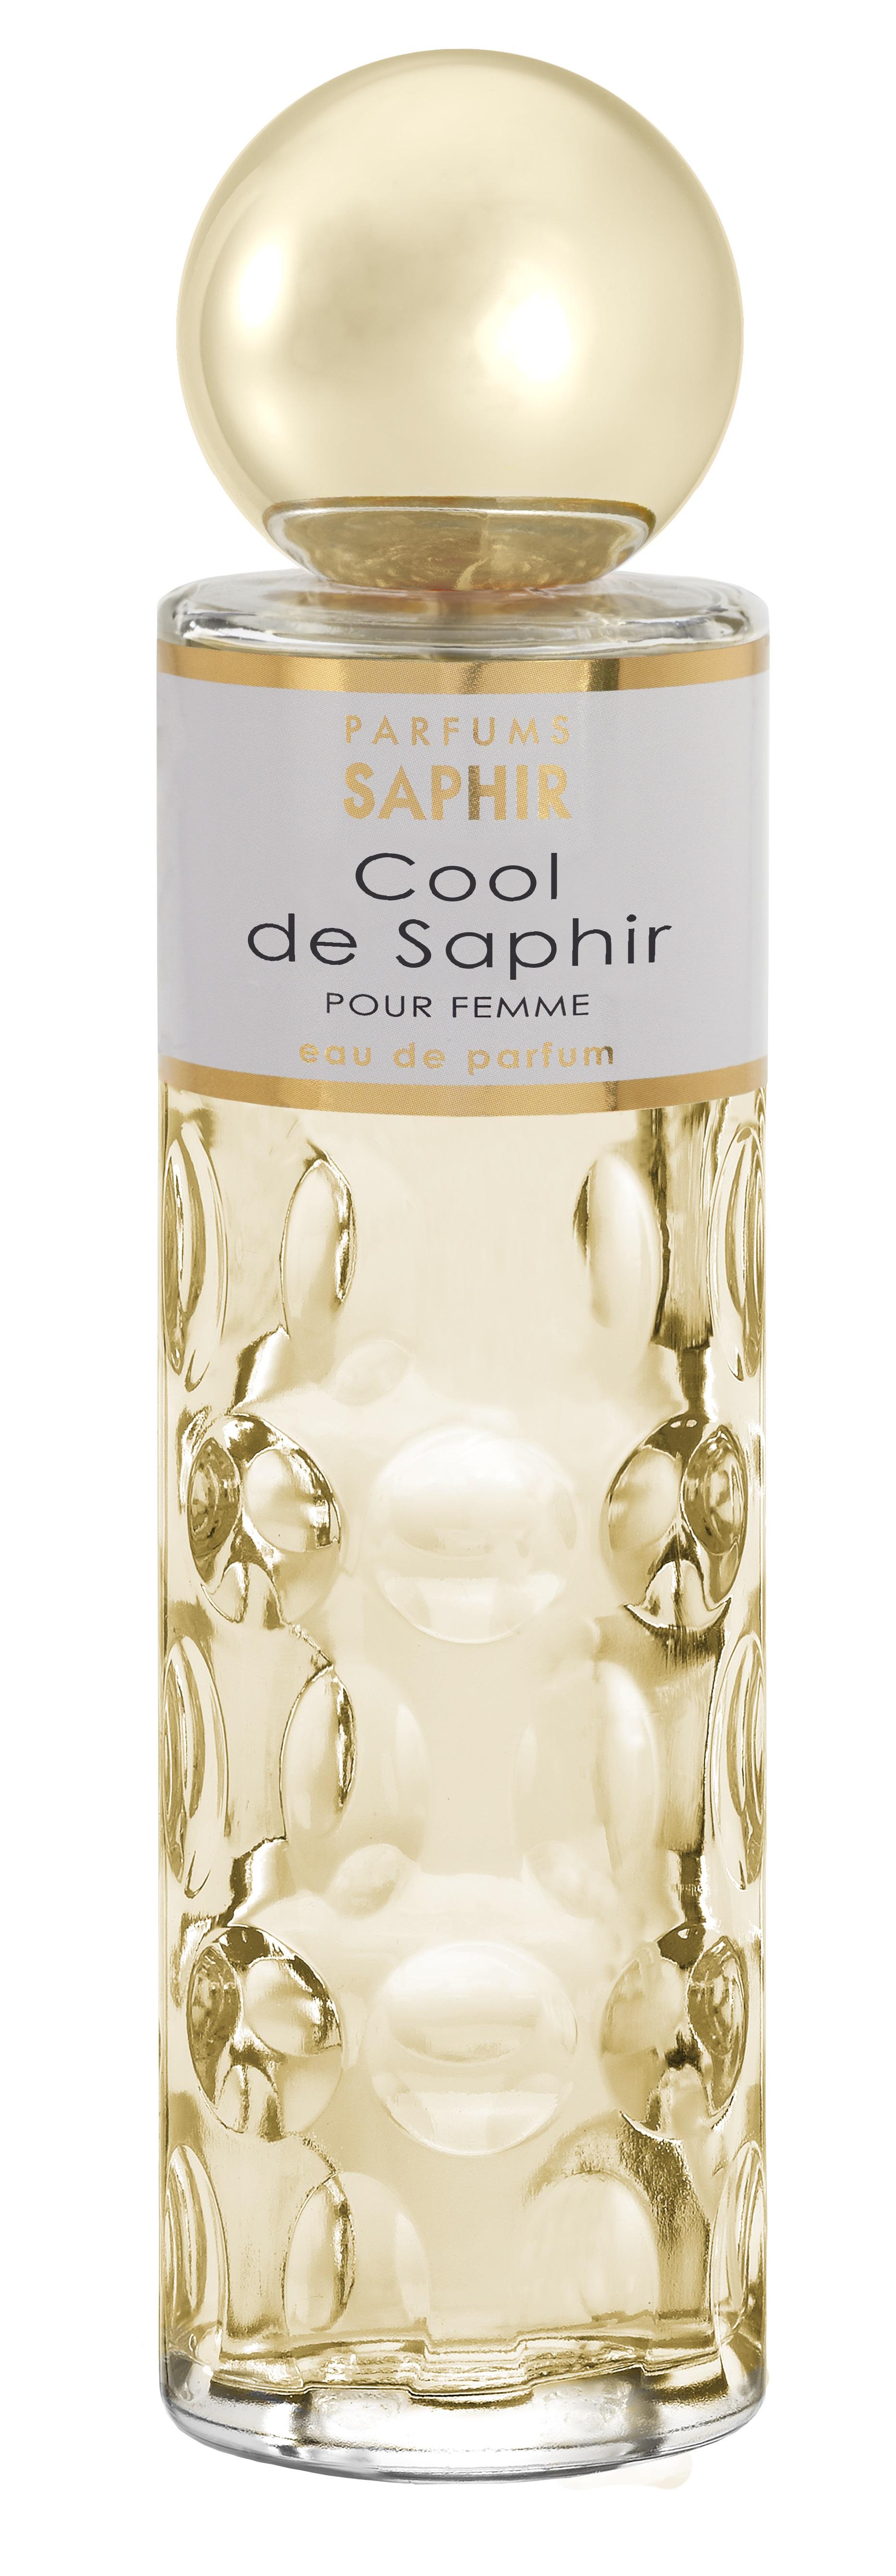 Saphir Cool  Eau de Parfum 200 ml